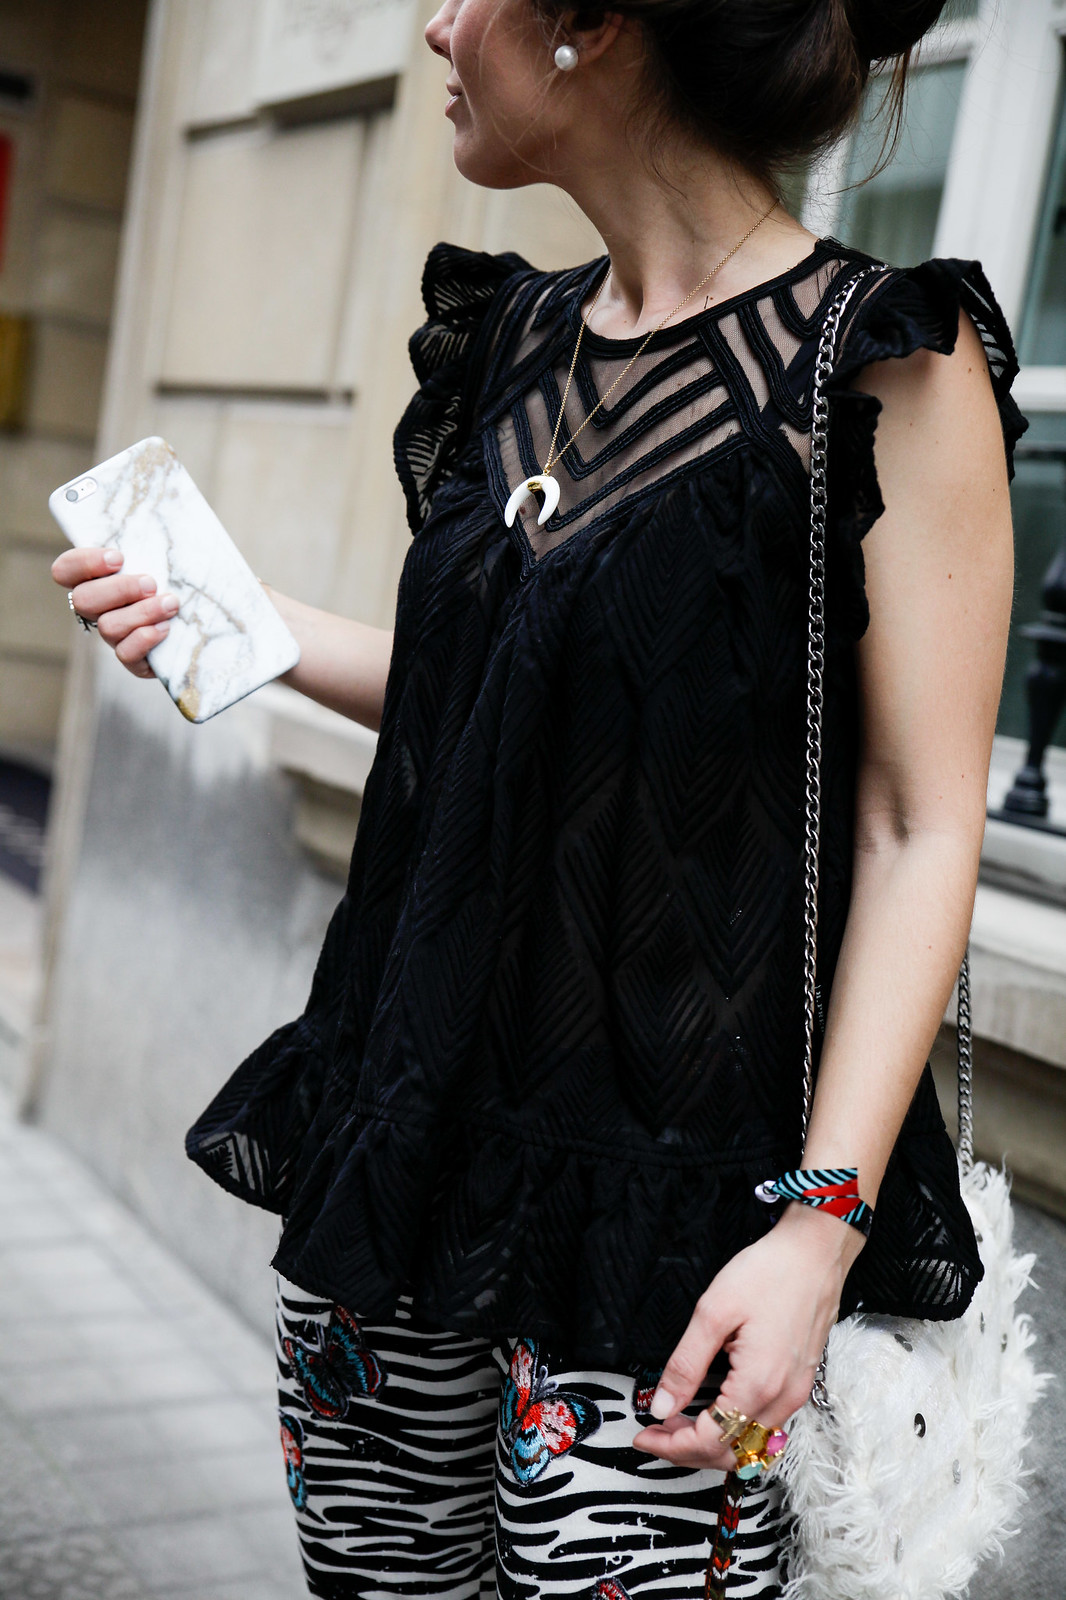 03_Pantalones_Zebra_Blusa_Boho_tacones_rosas_stradivarius_Theguestgirl_outfit_barcelona_streetstyle